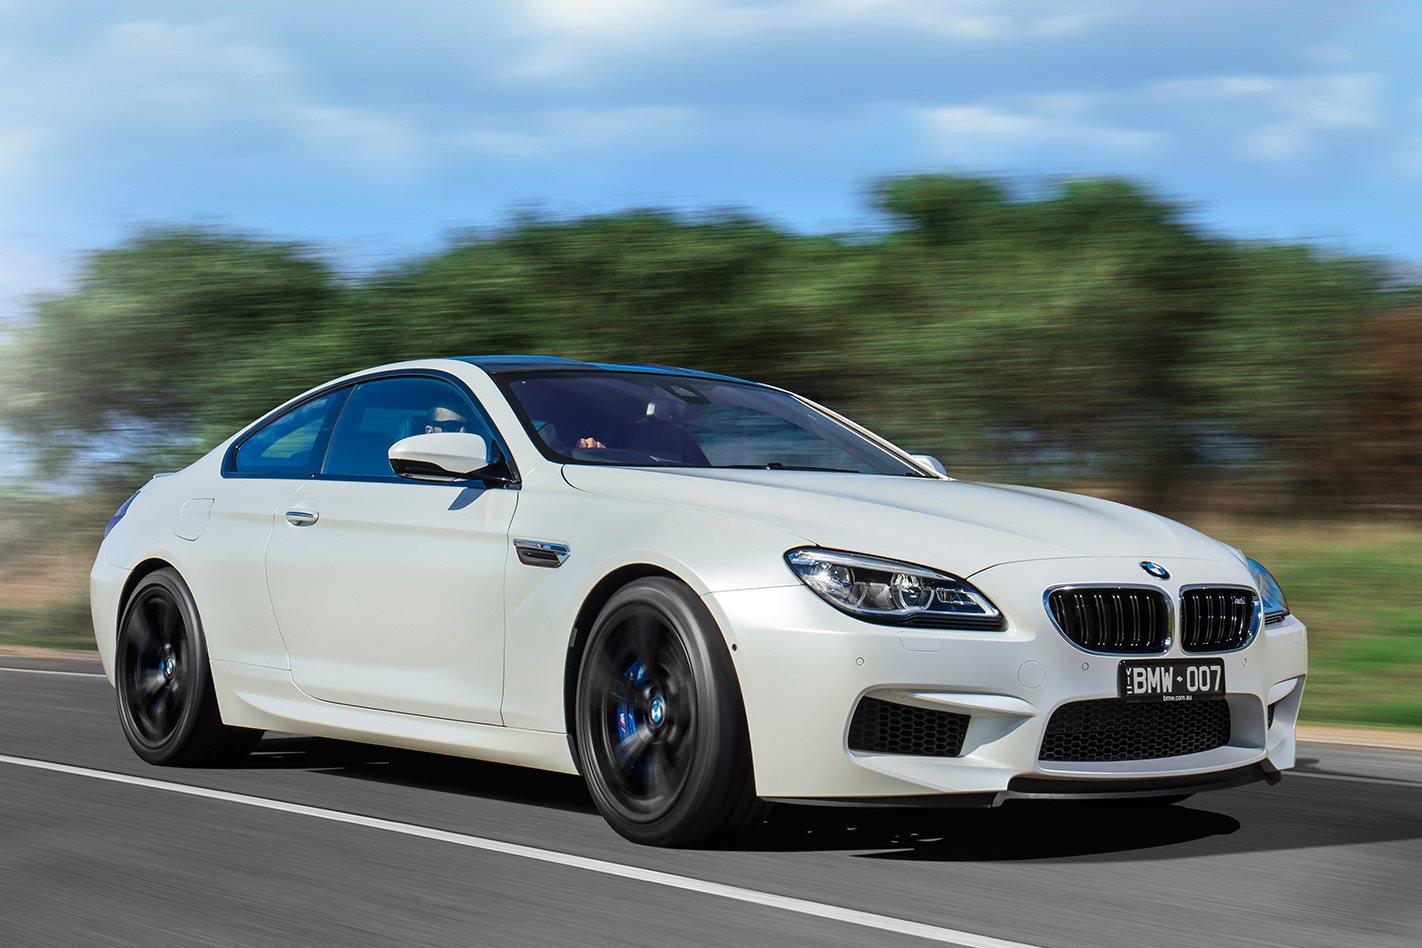 BMW 5 Series bmw m6 vs maserati granturismo BMW M6 review | MOTOR